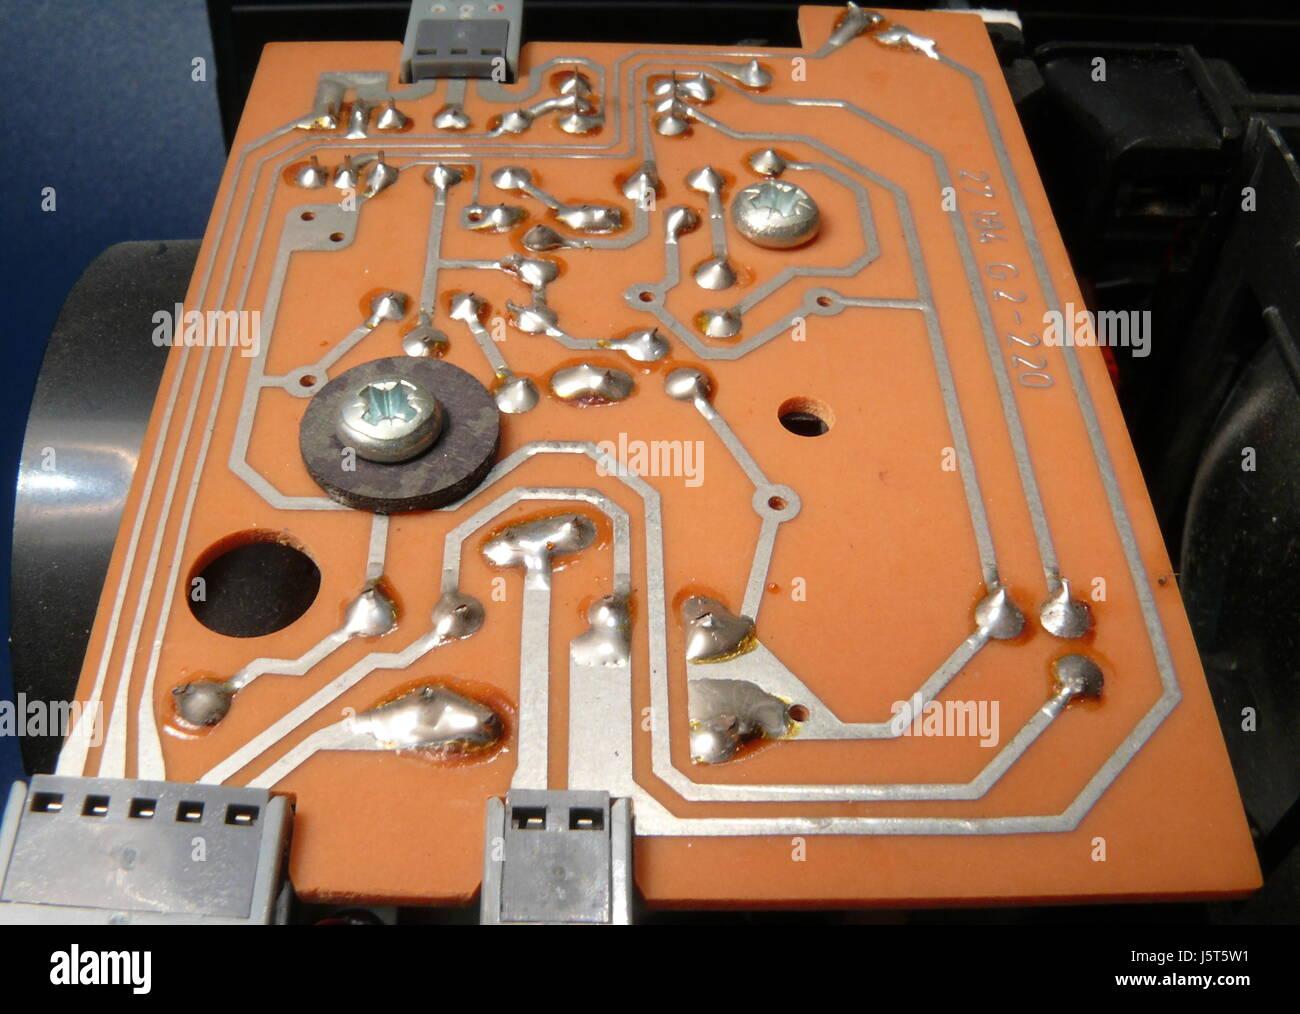 Antique Fuse Box Circuit Board Electrical Wiring Diagrams Printed With Diagram Symbols U2022 Mini